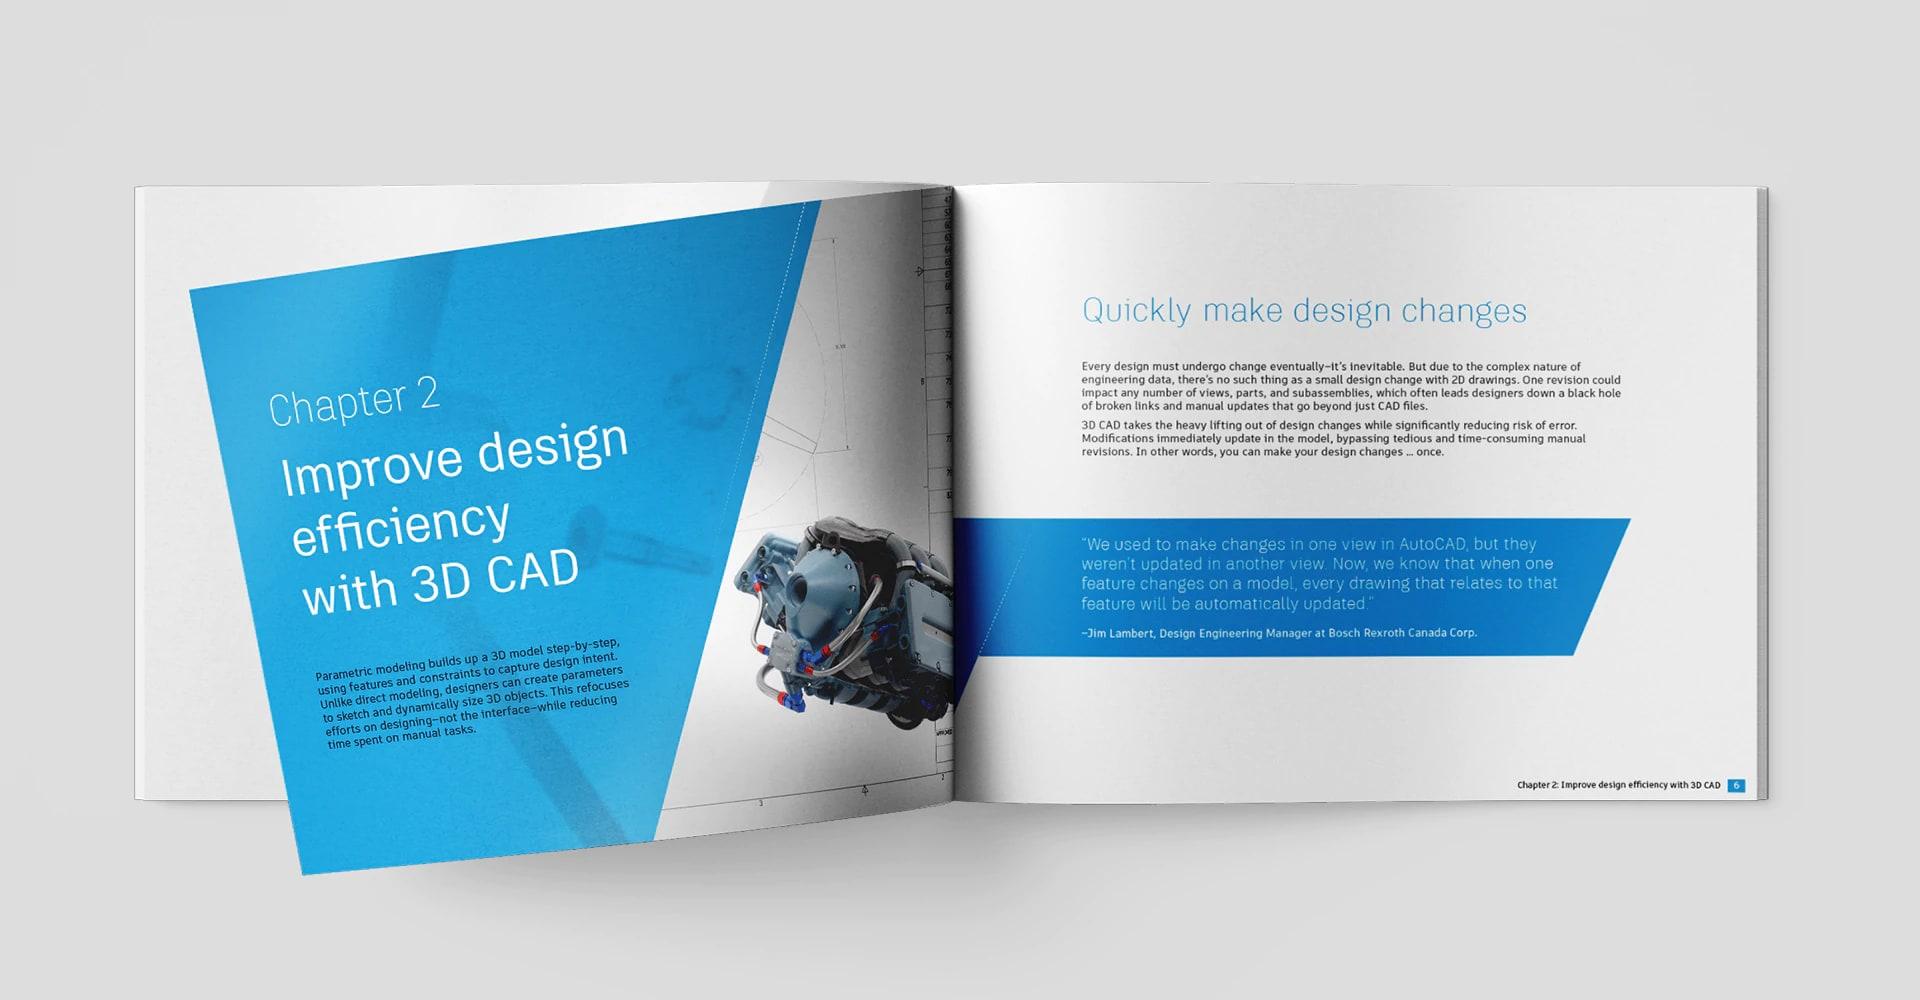 AutoCAD와 Inventor를 더 효과적으로 연동하는 방법 참조